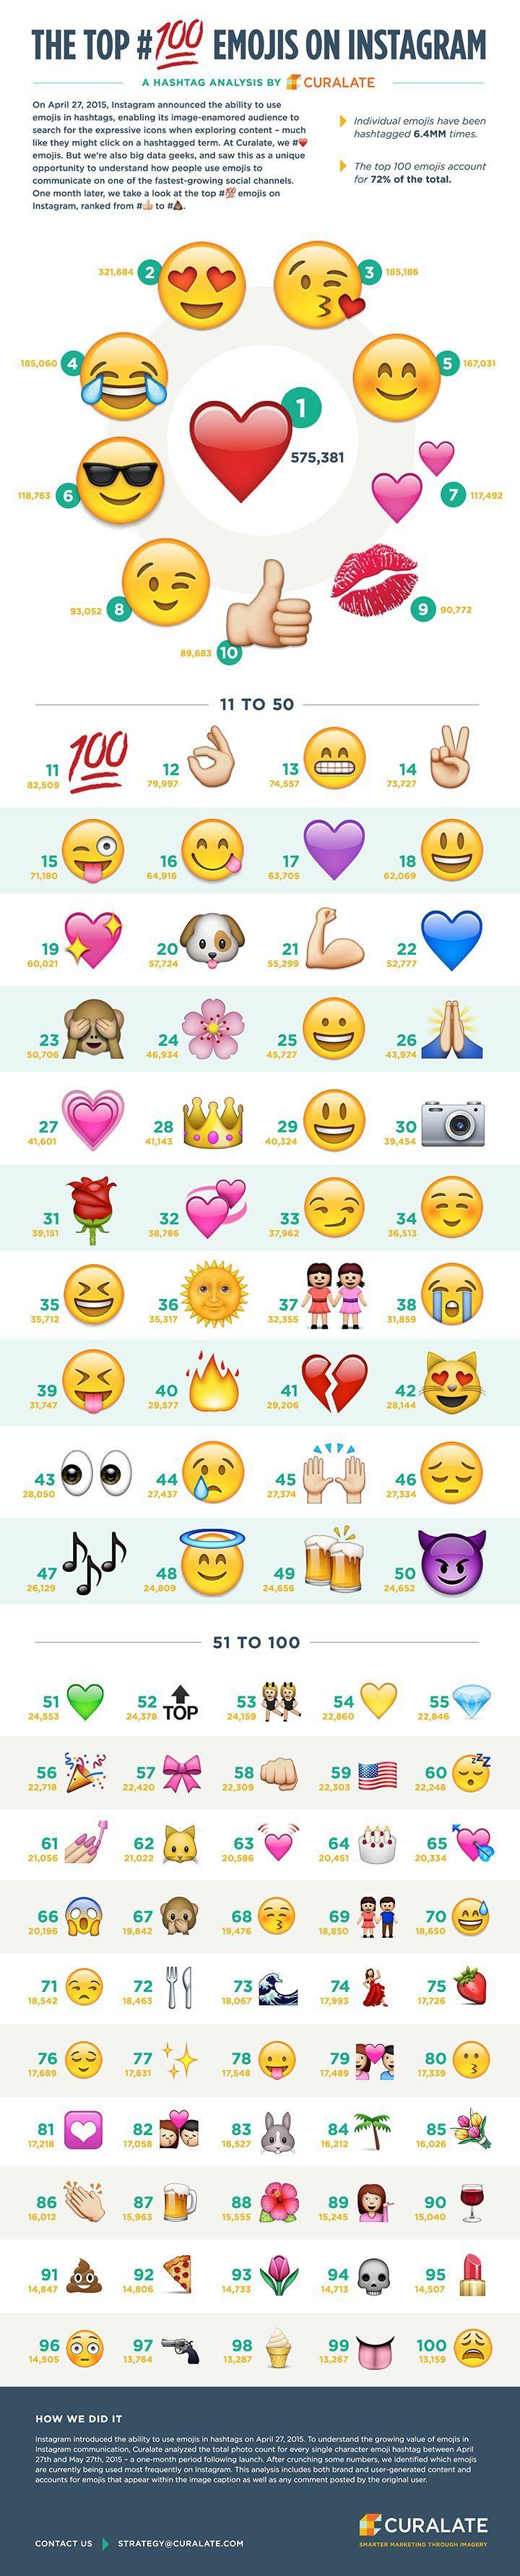 The 100 Most Popular Emojis on Instagram [Infographic], via @HubSpot